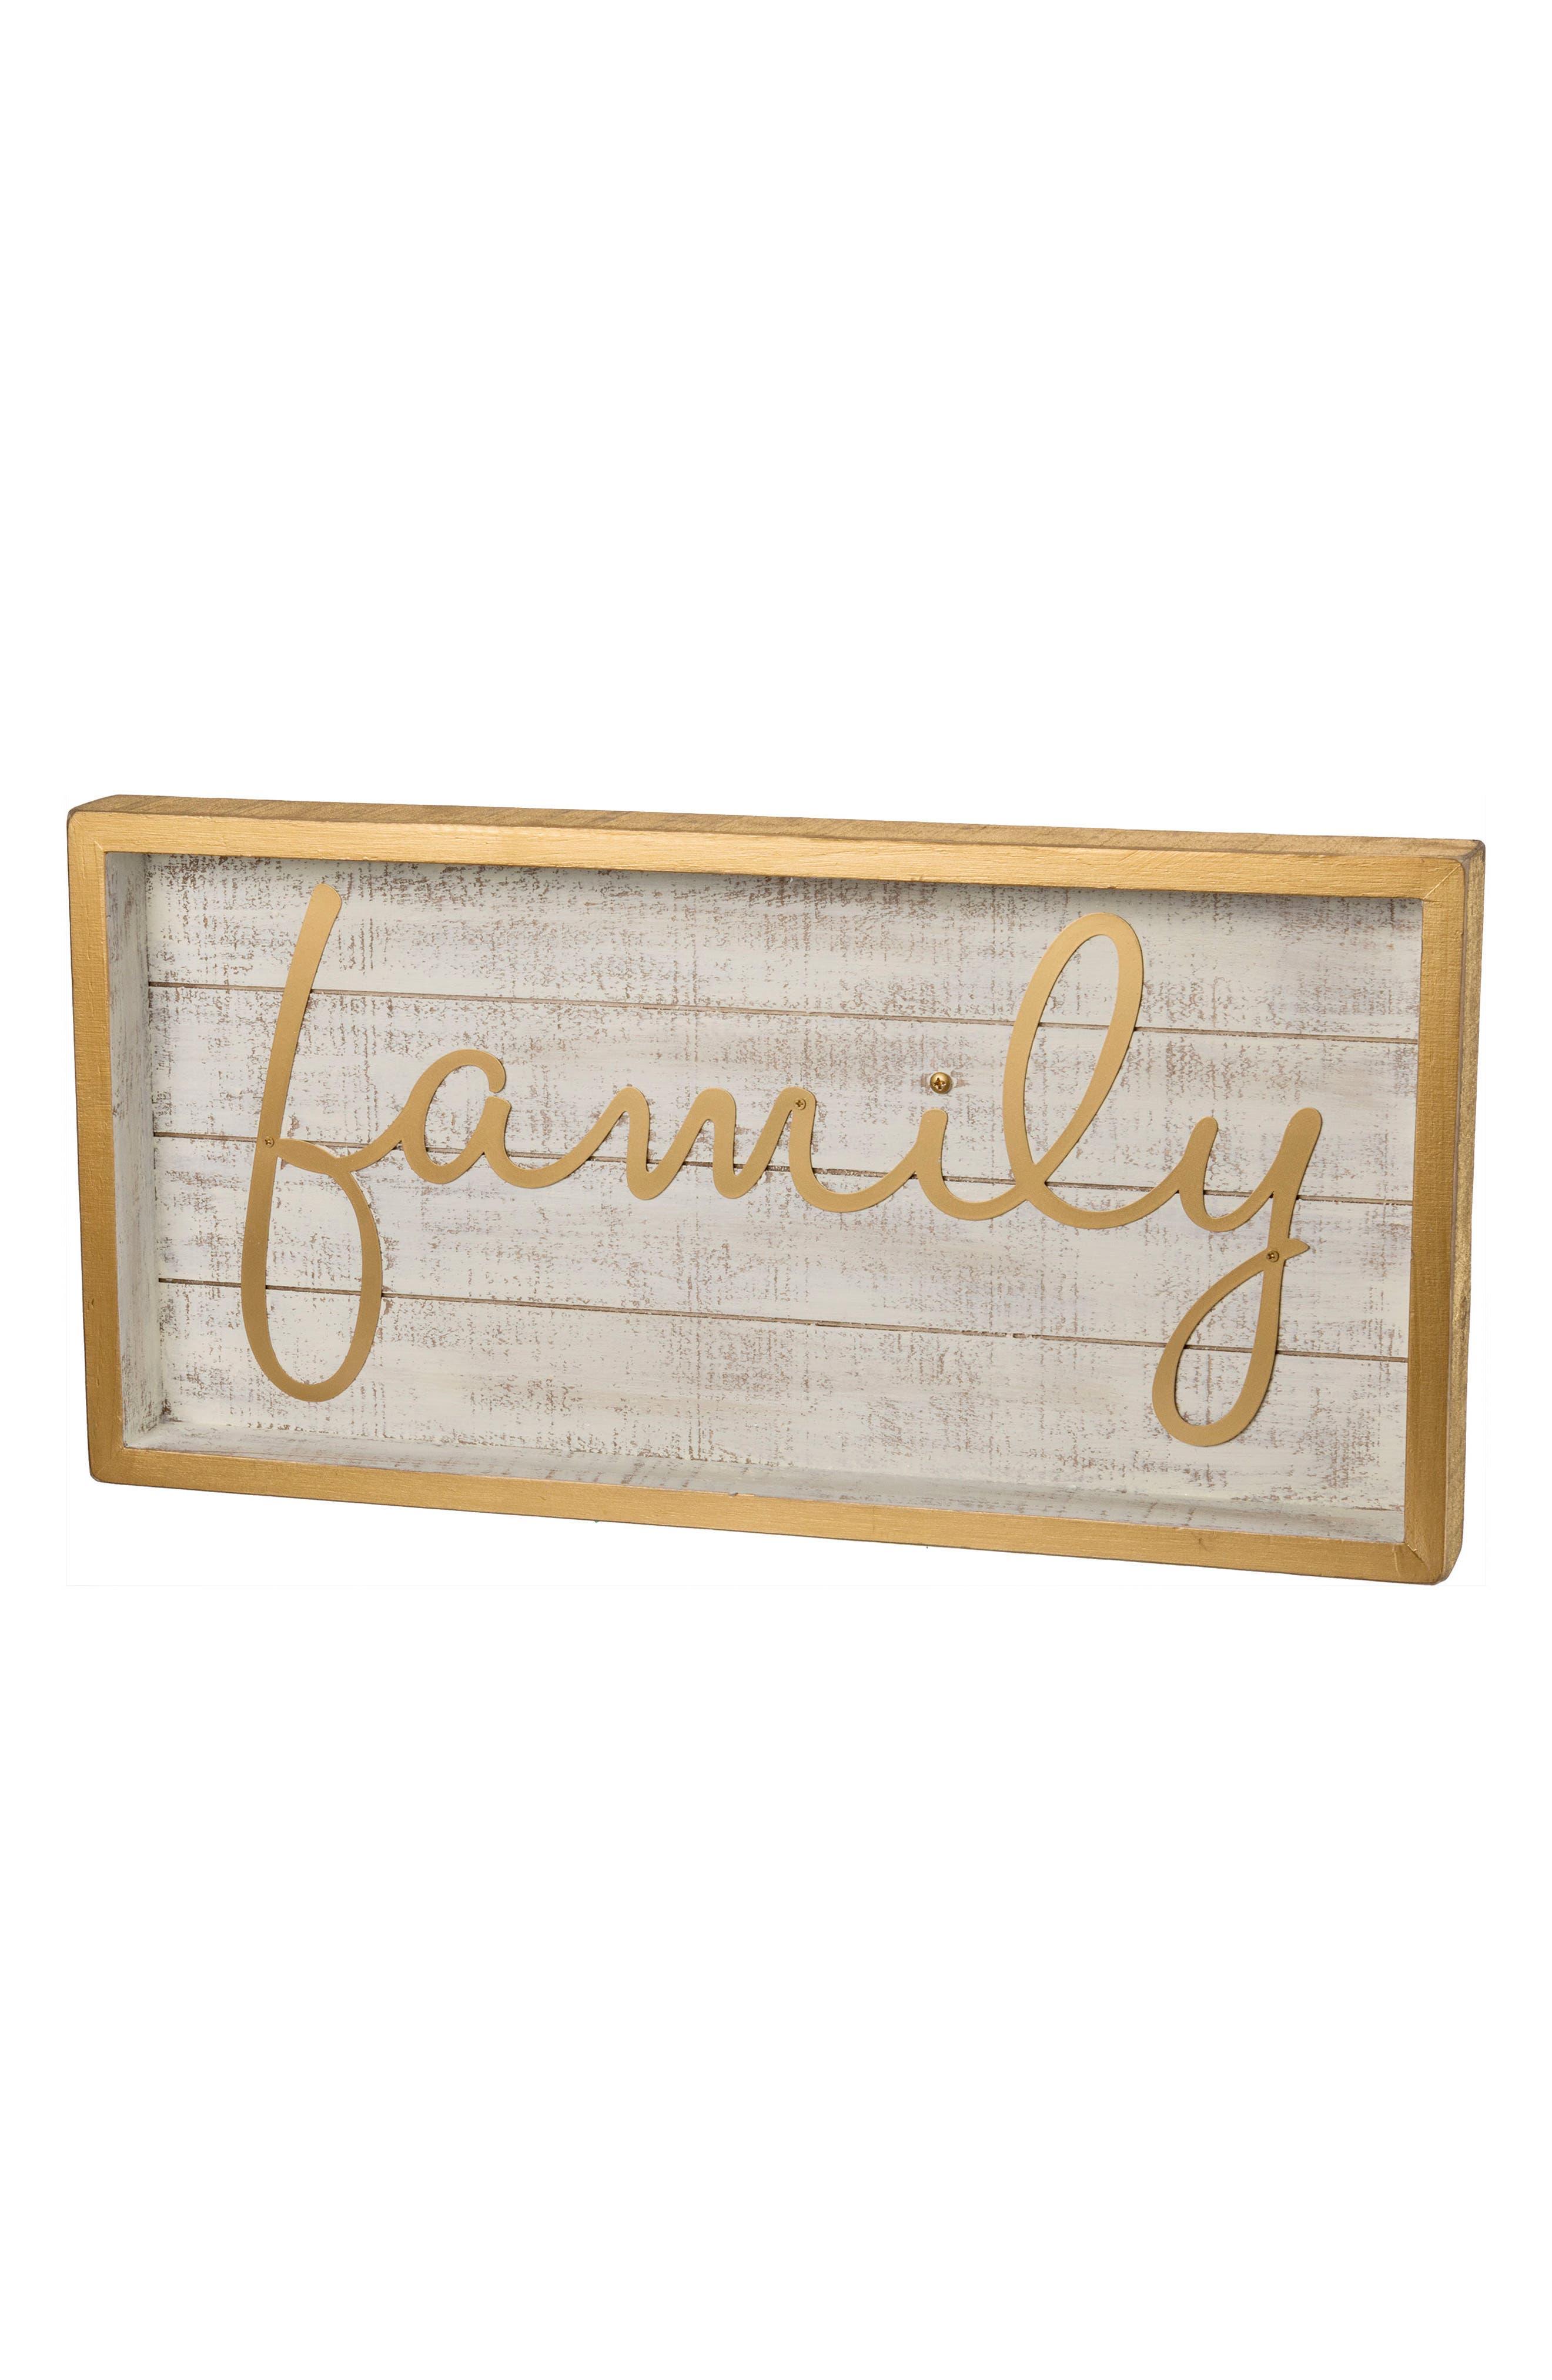 Main Image - Primitives by Kathy Family Box Sign